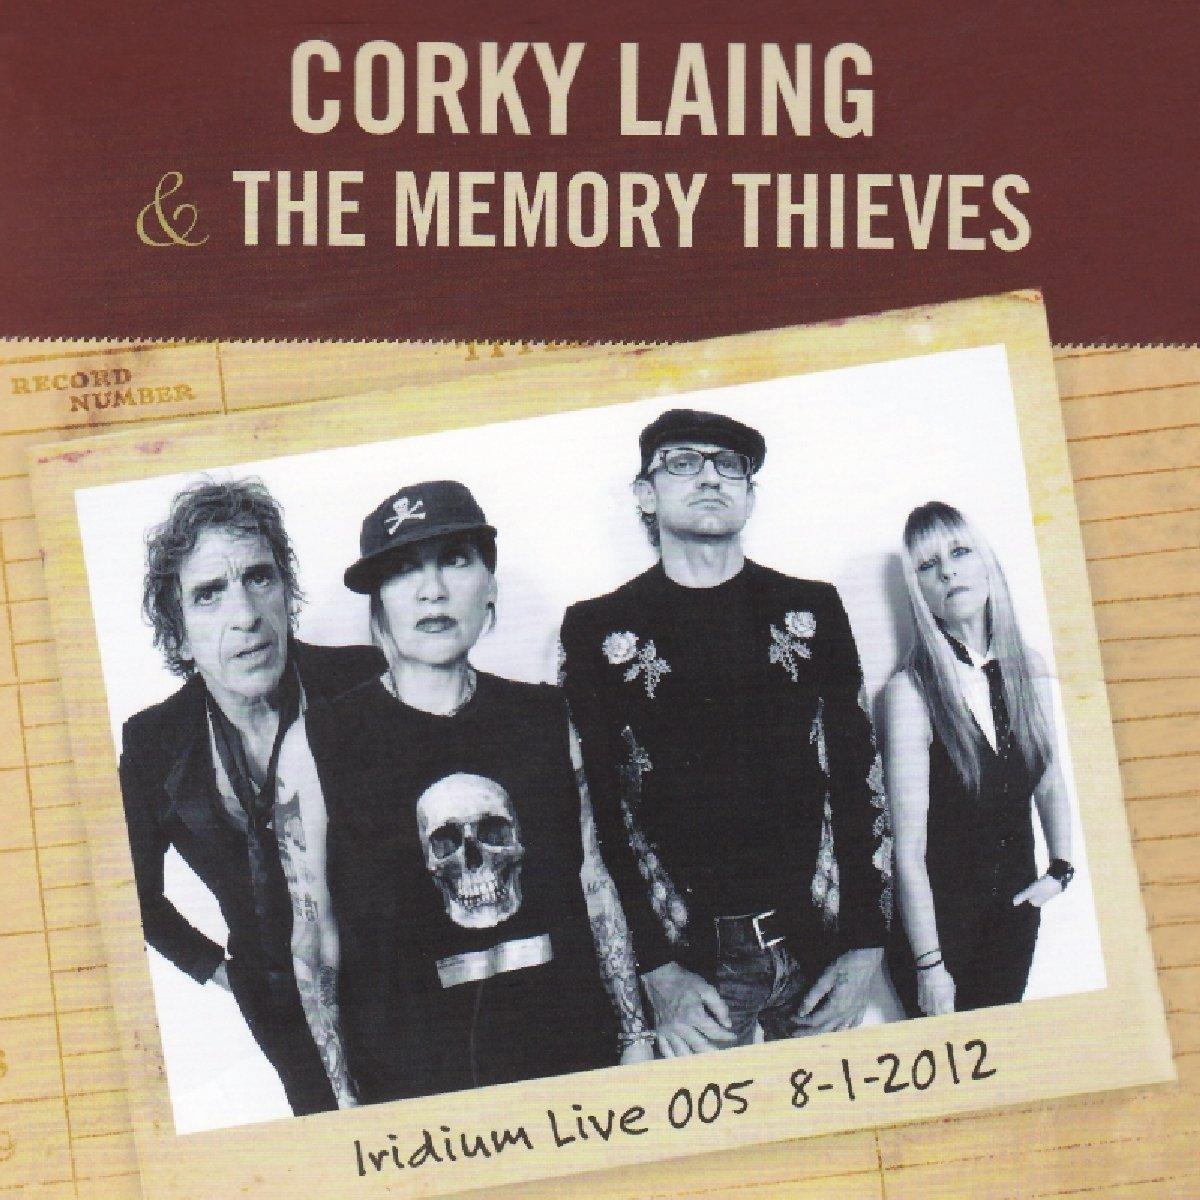 Corky Laing & The Memory Thieves – Iridium Live 005 8-1-2012 (2013) [FLAC]